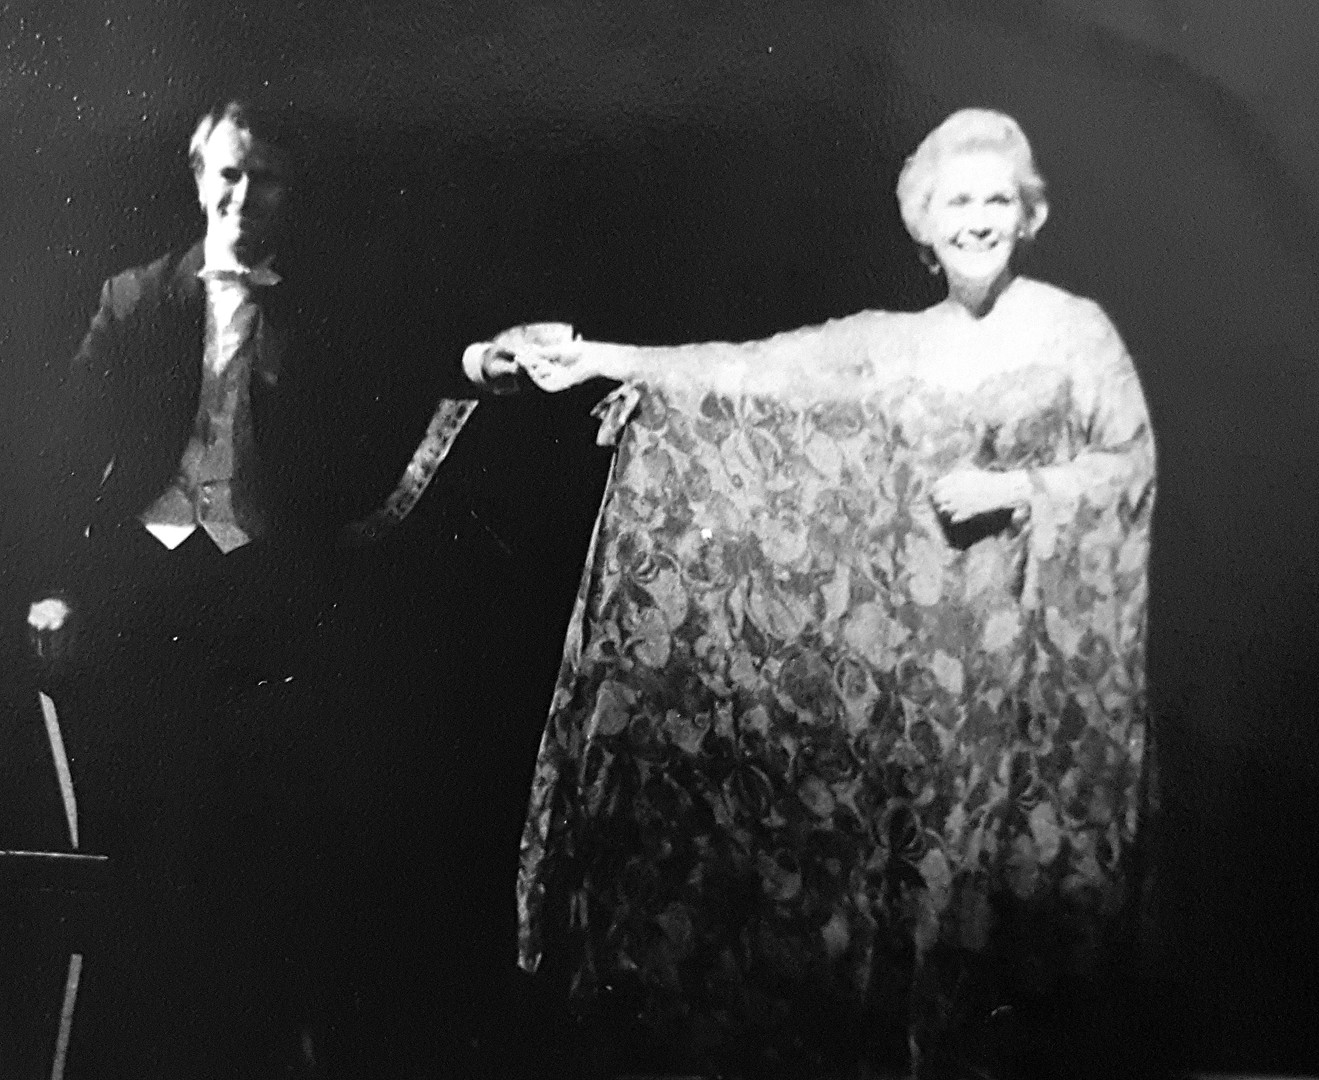 Elisabeth Schwartzkopf & Brian Lamport - 1970